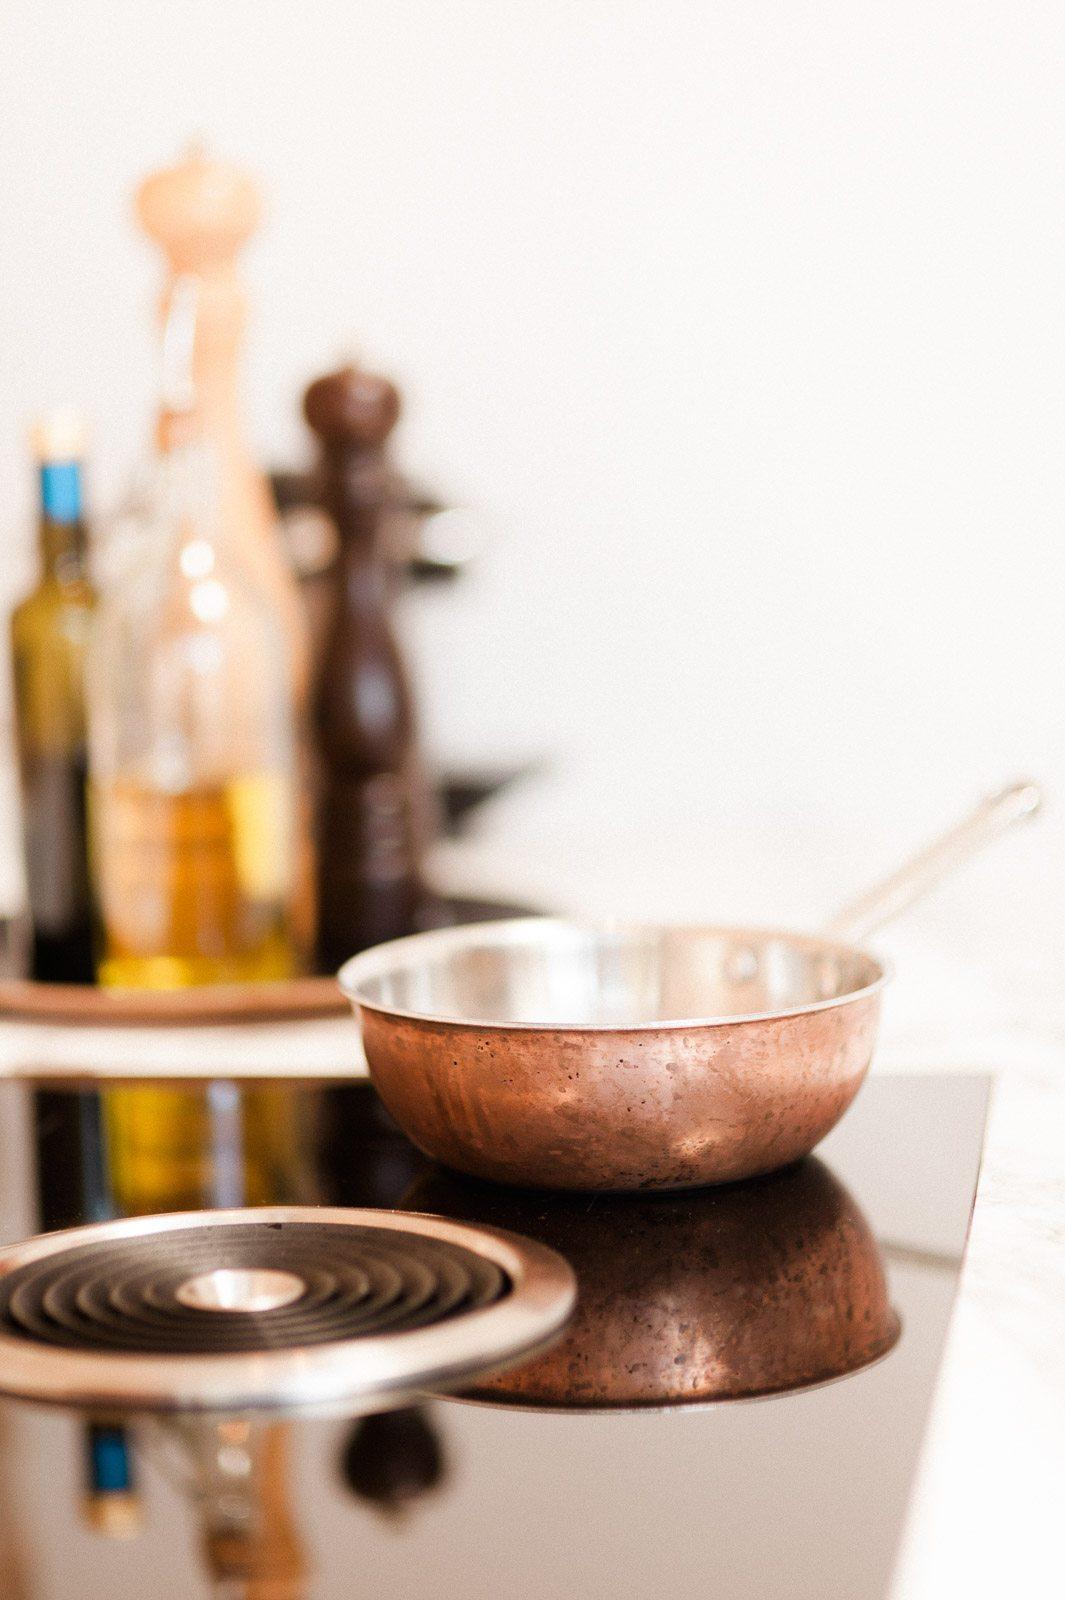 Keuken gerei aanrecht